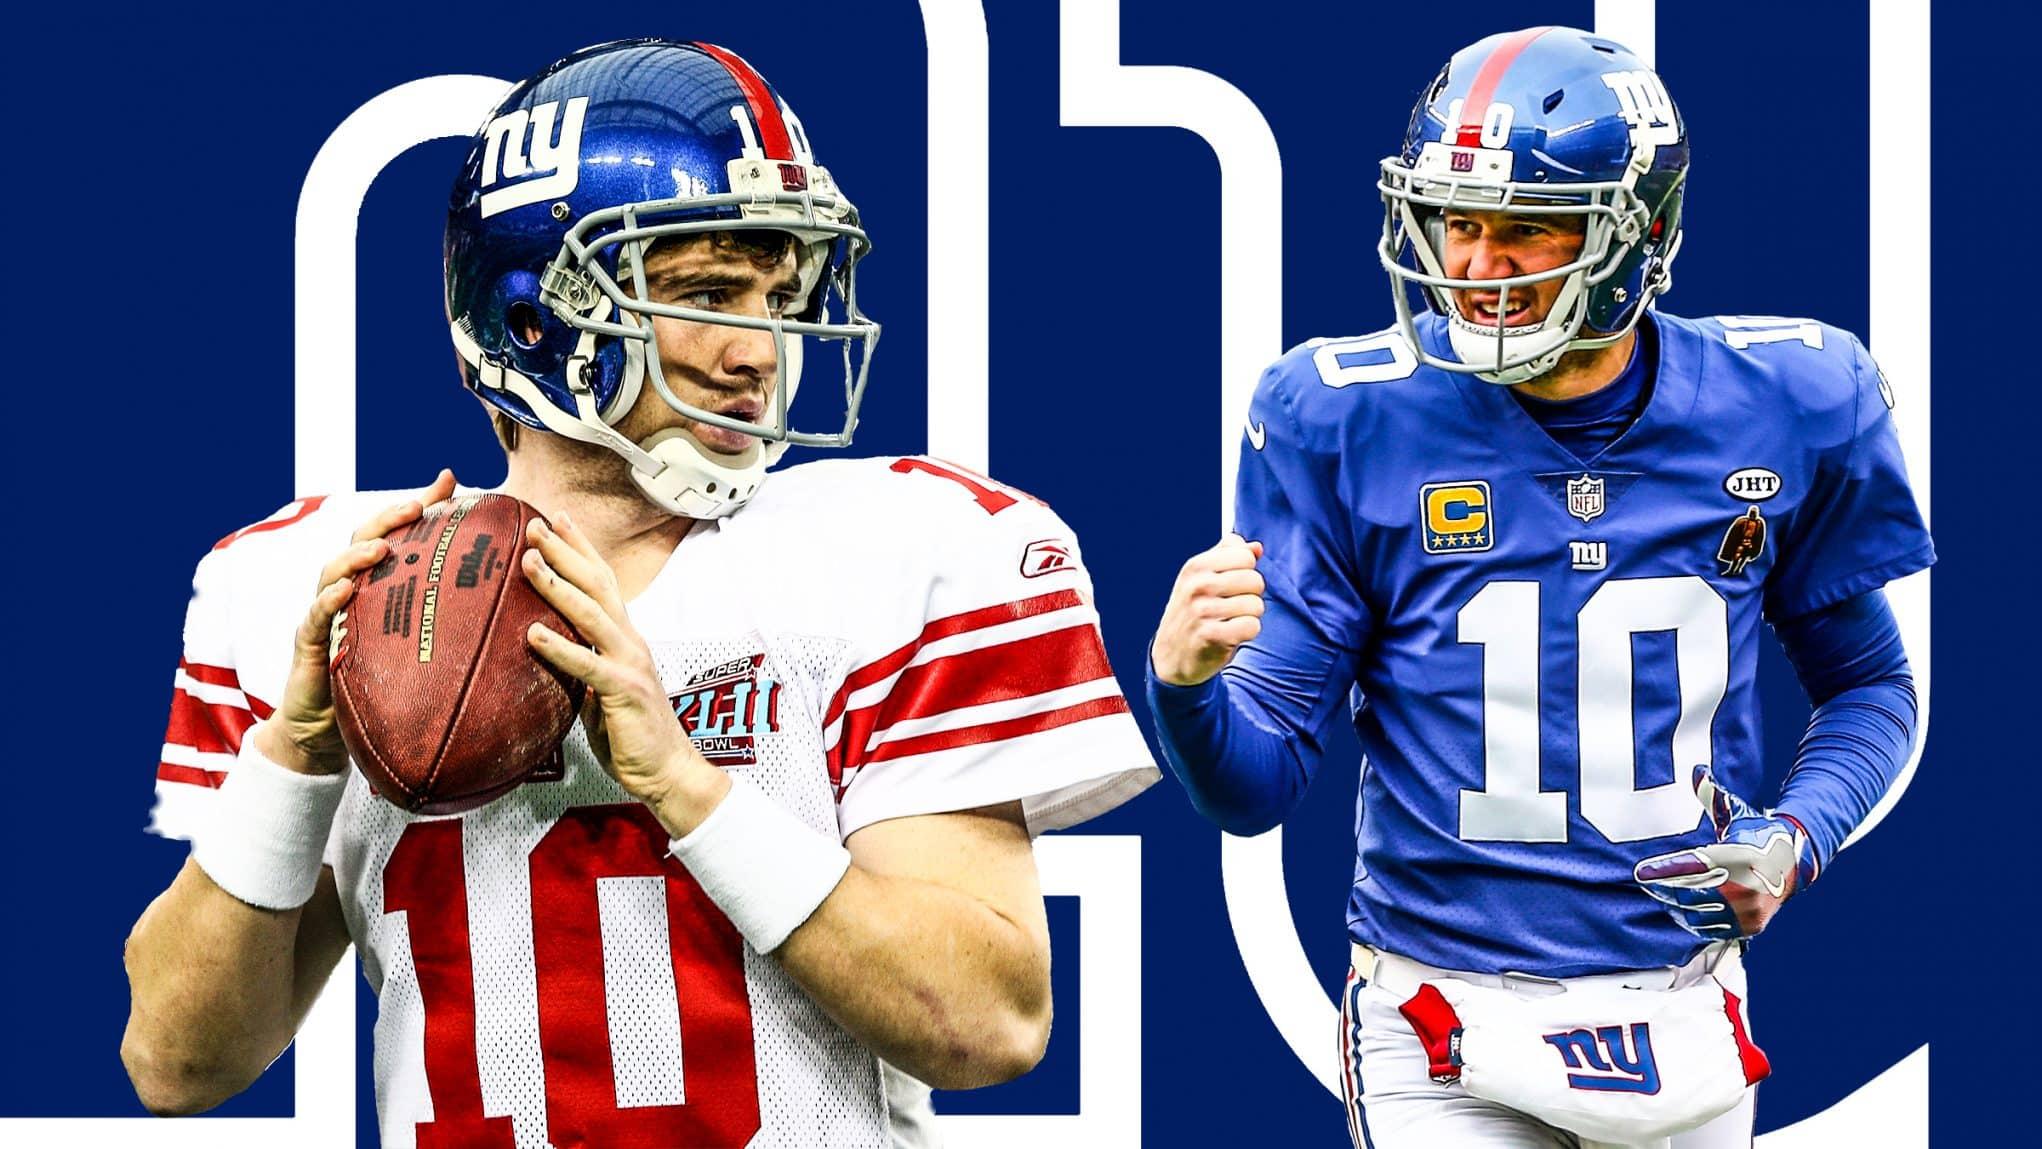 d703aa23c36 New York Giants 2019 NFL schedule officially released